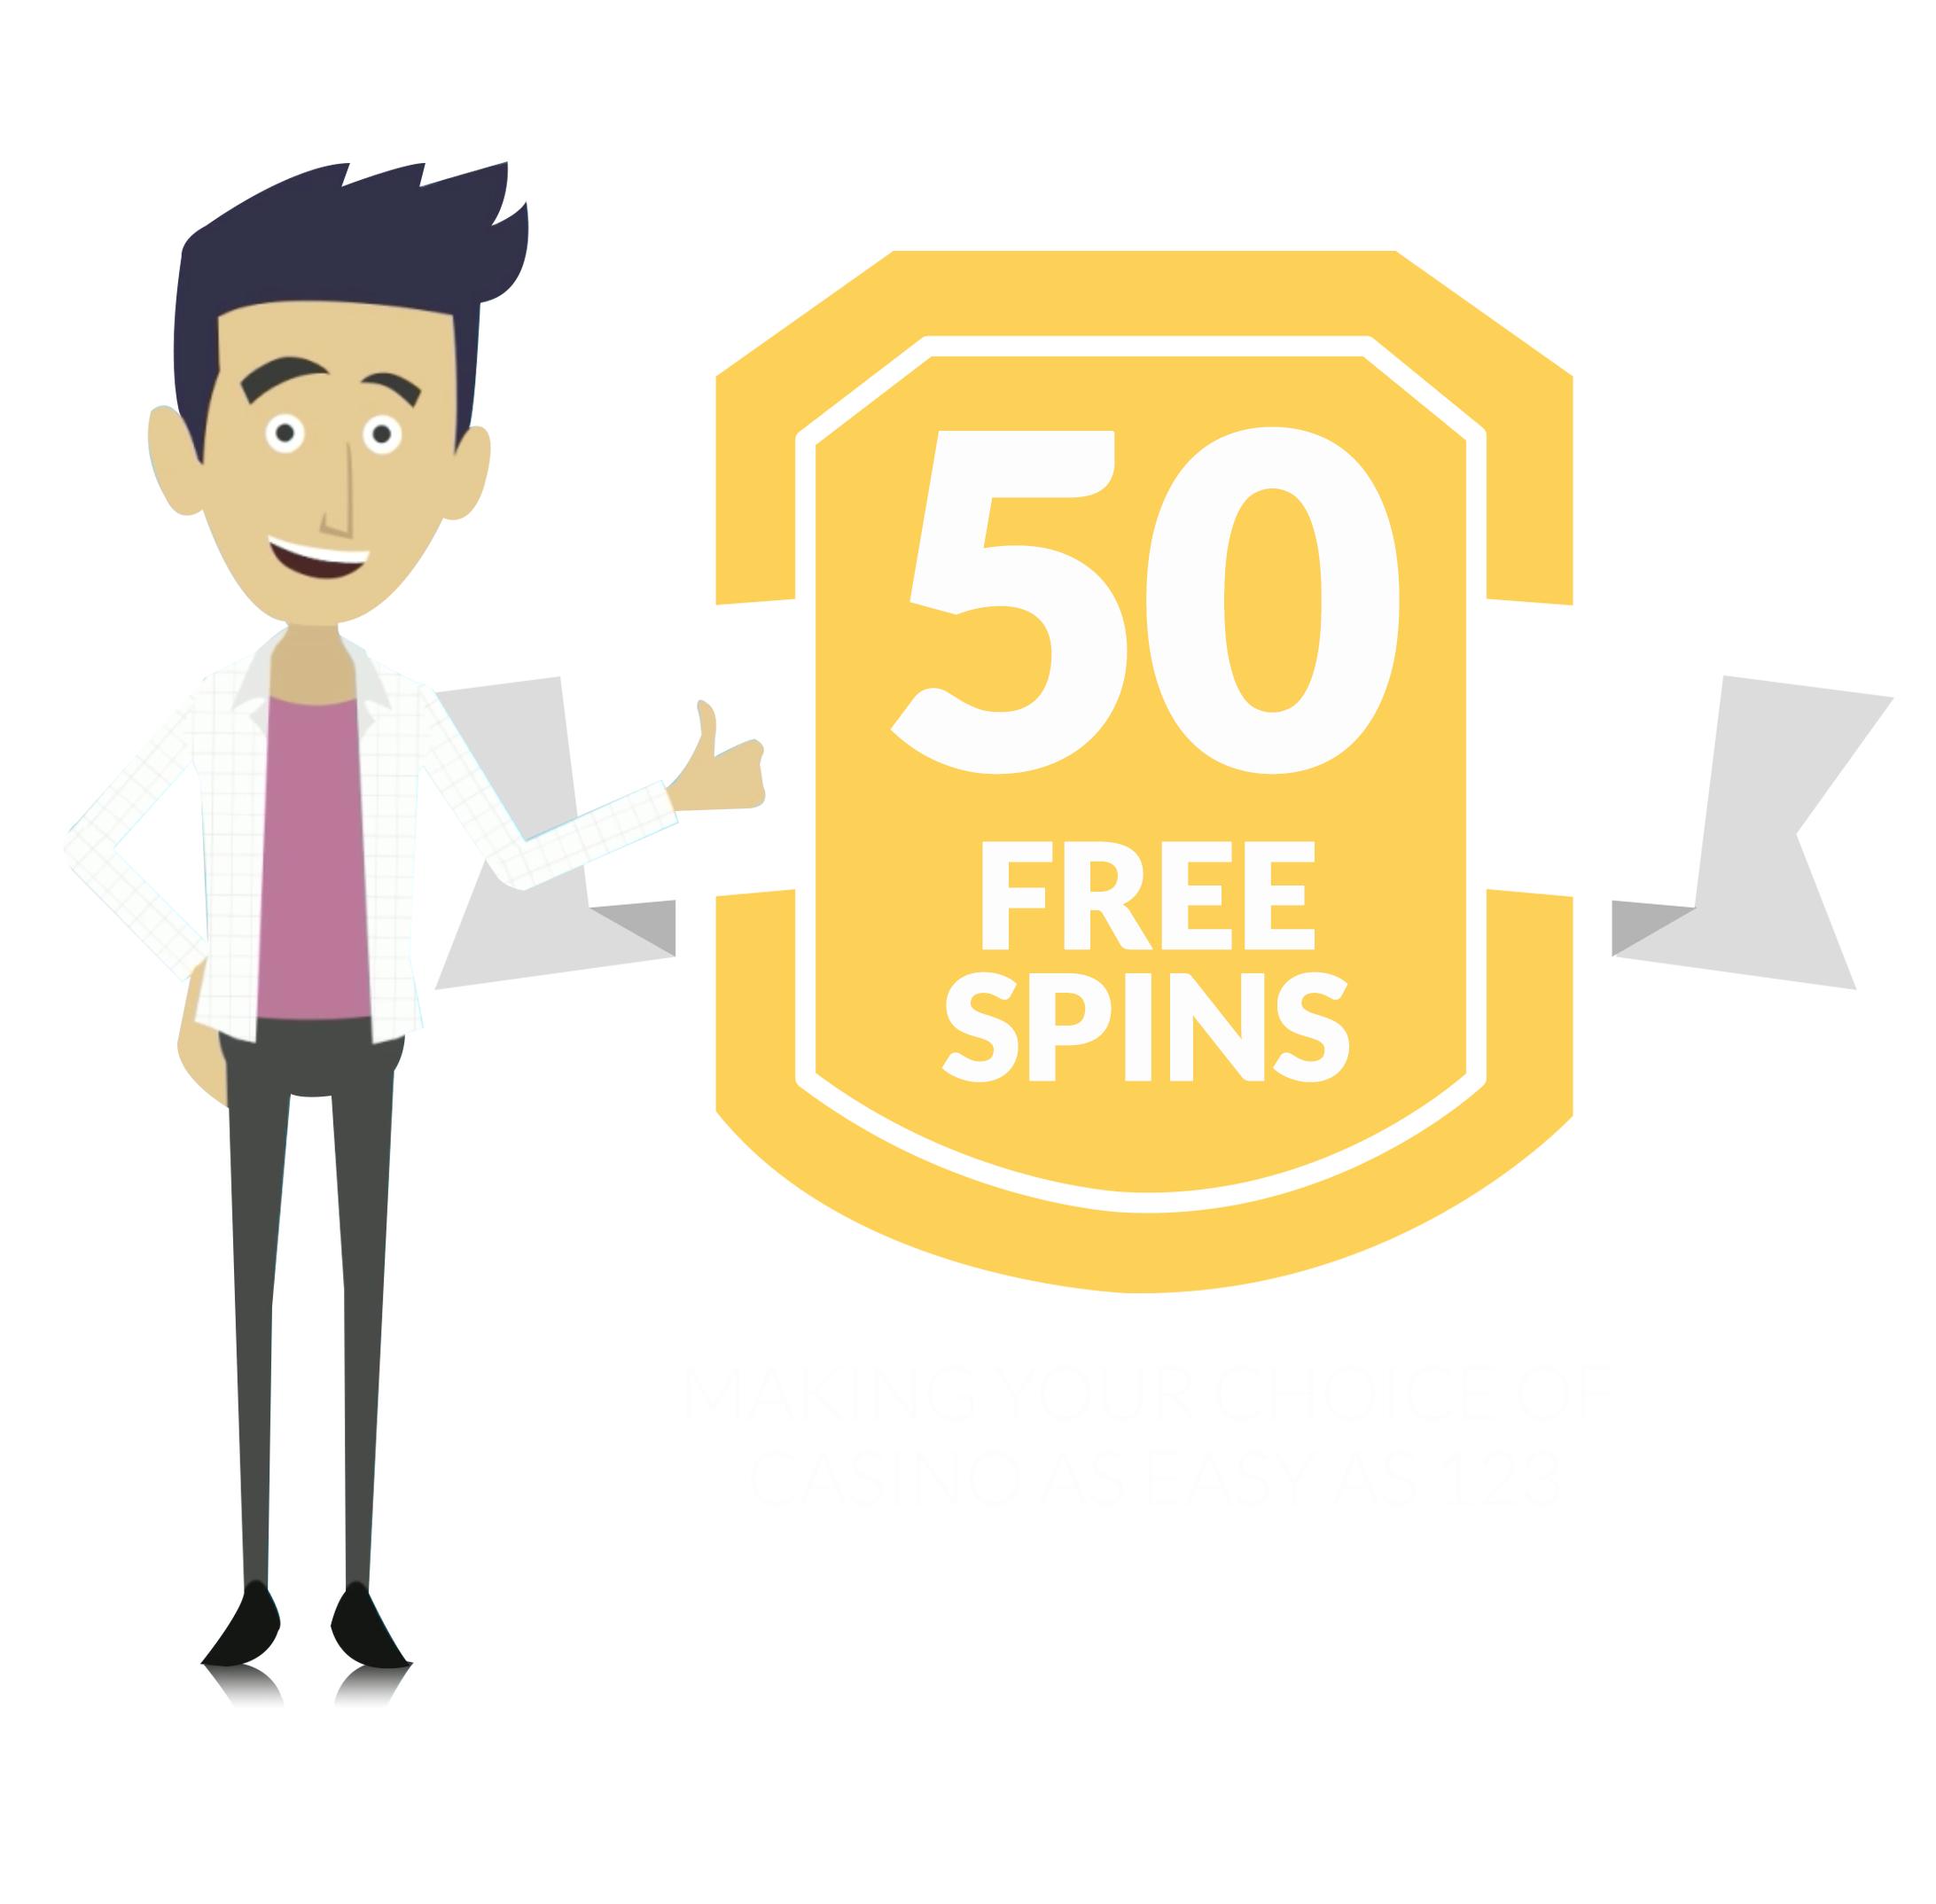 Free Spins Casino Uk